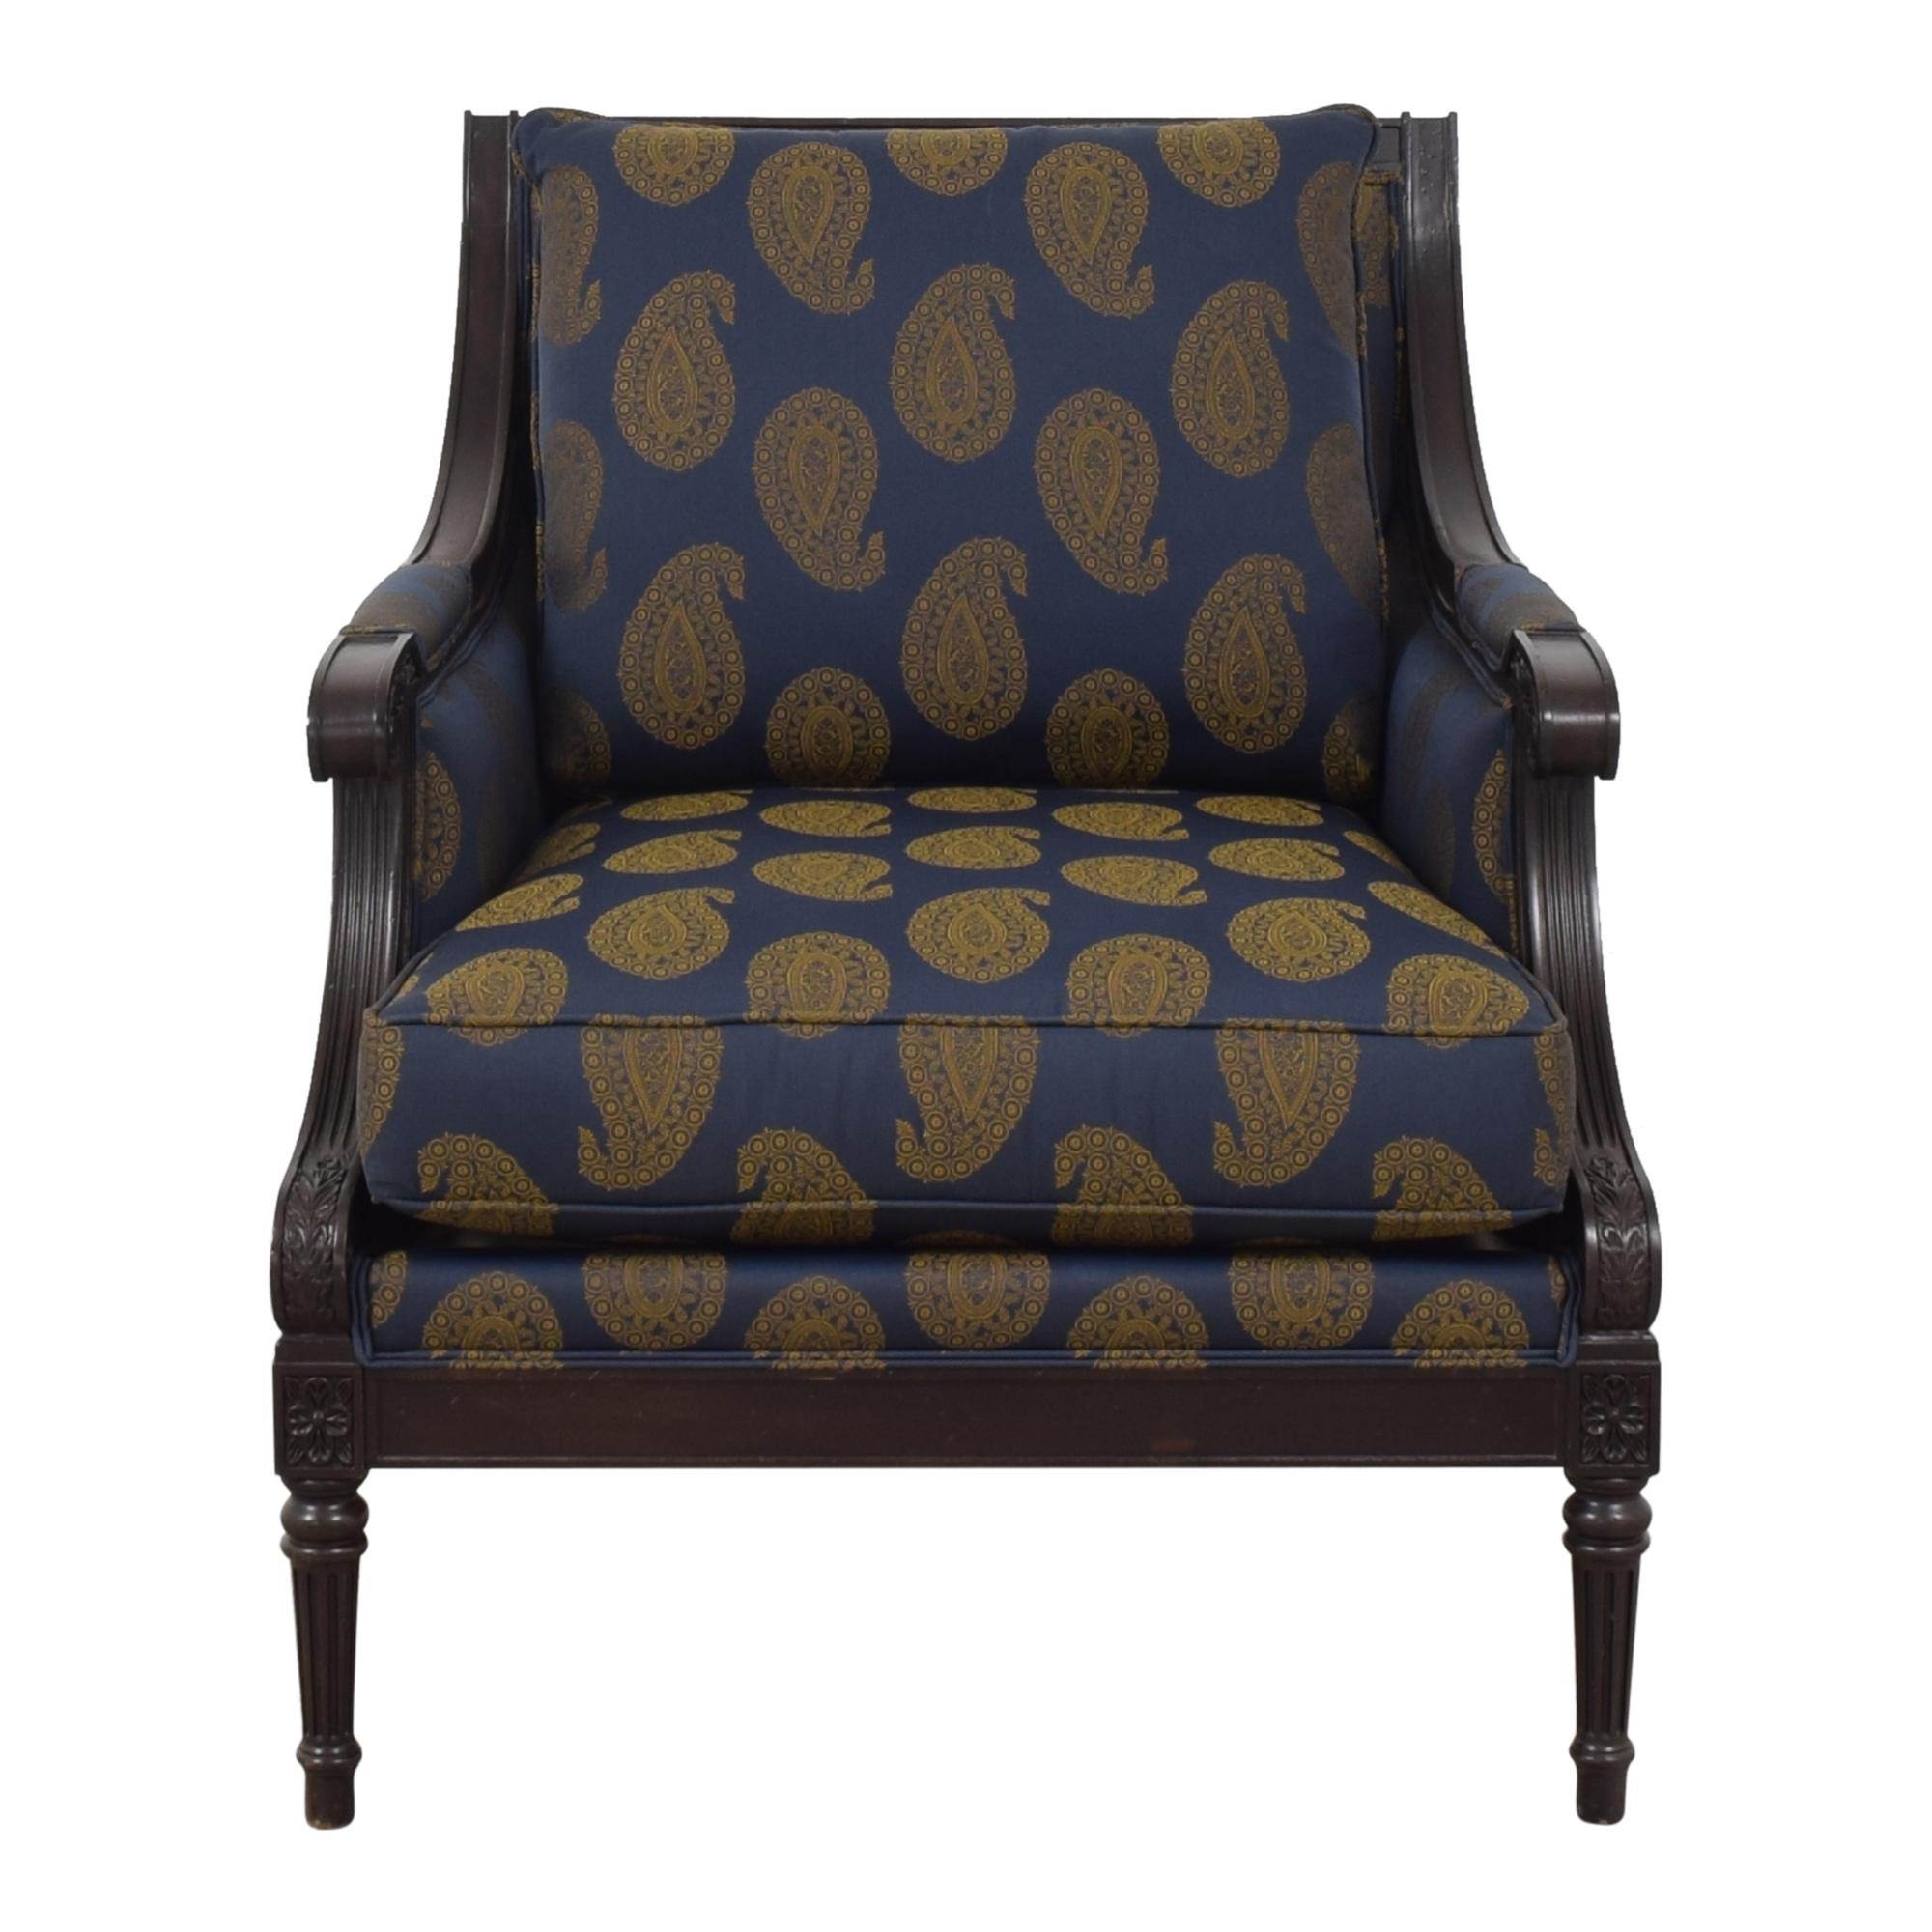 Ethan Allen  Ethan Allen Fairfax Arm Chair Accent Chairs